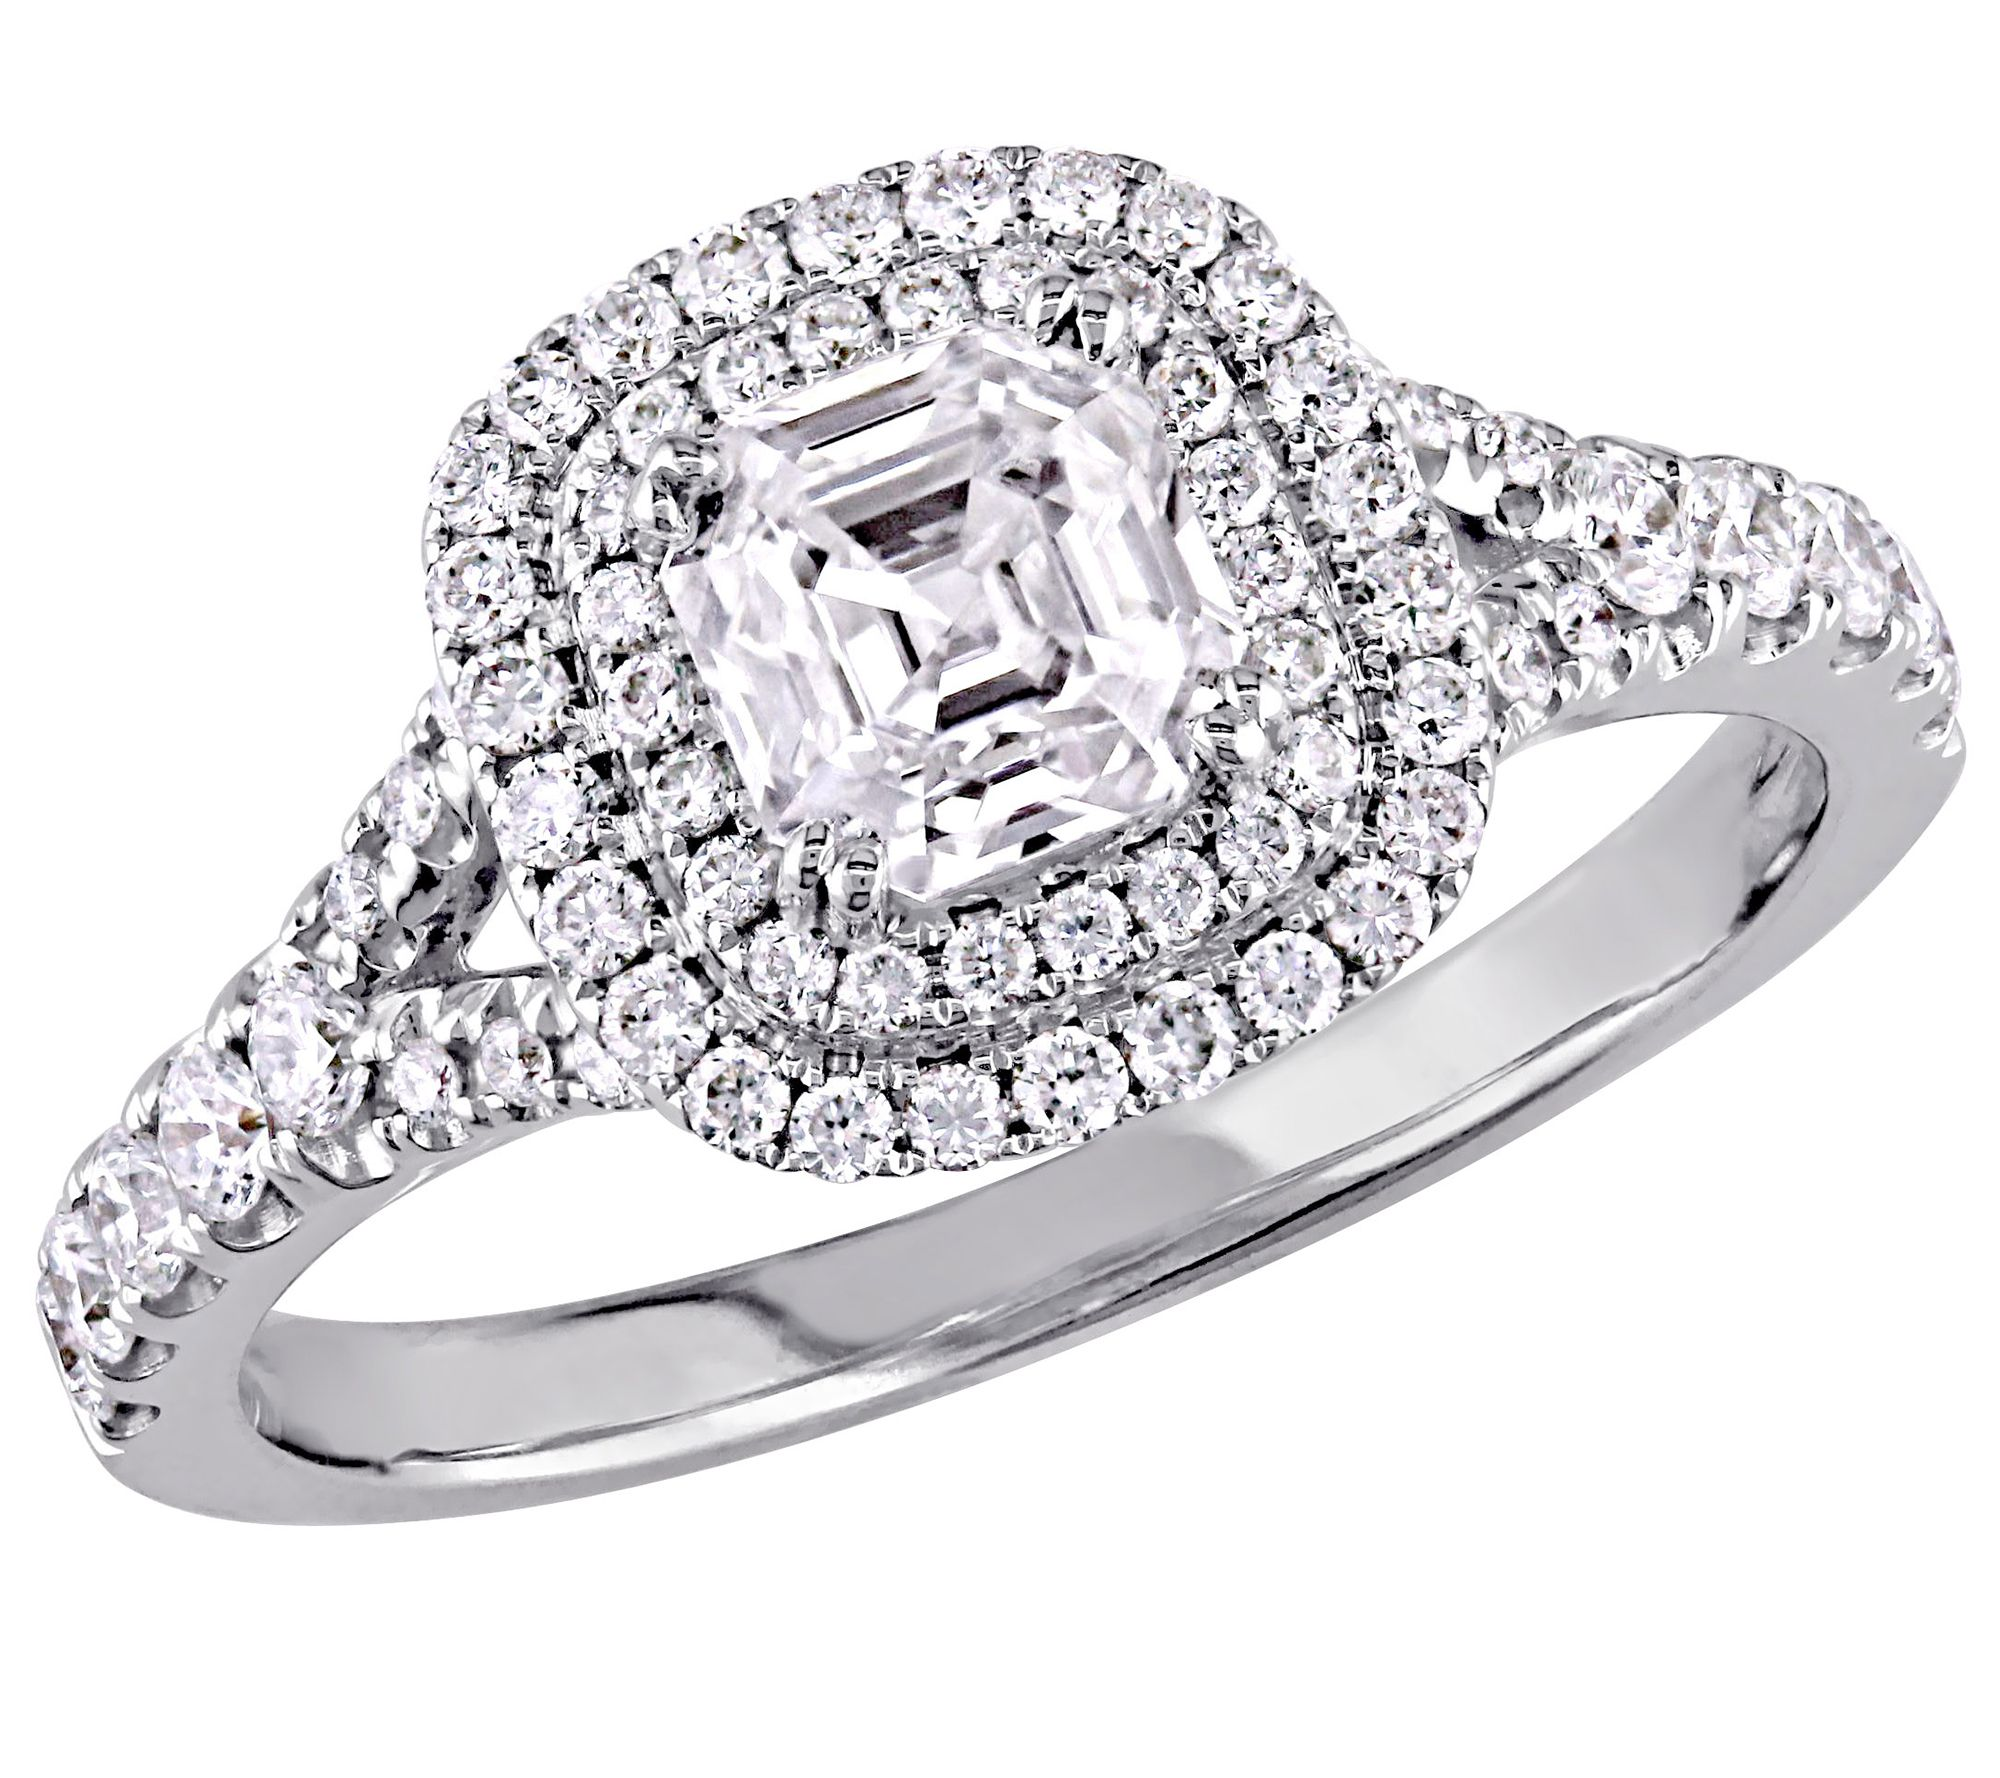 8053c915a Affinity 1.15 cttw Asscher Cut DiamondRing, 14K — QVC.com